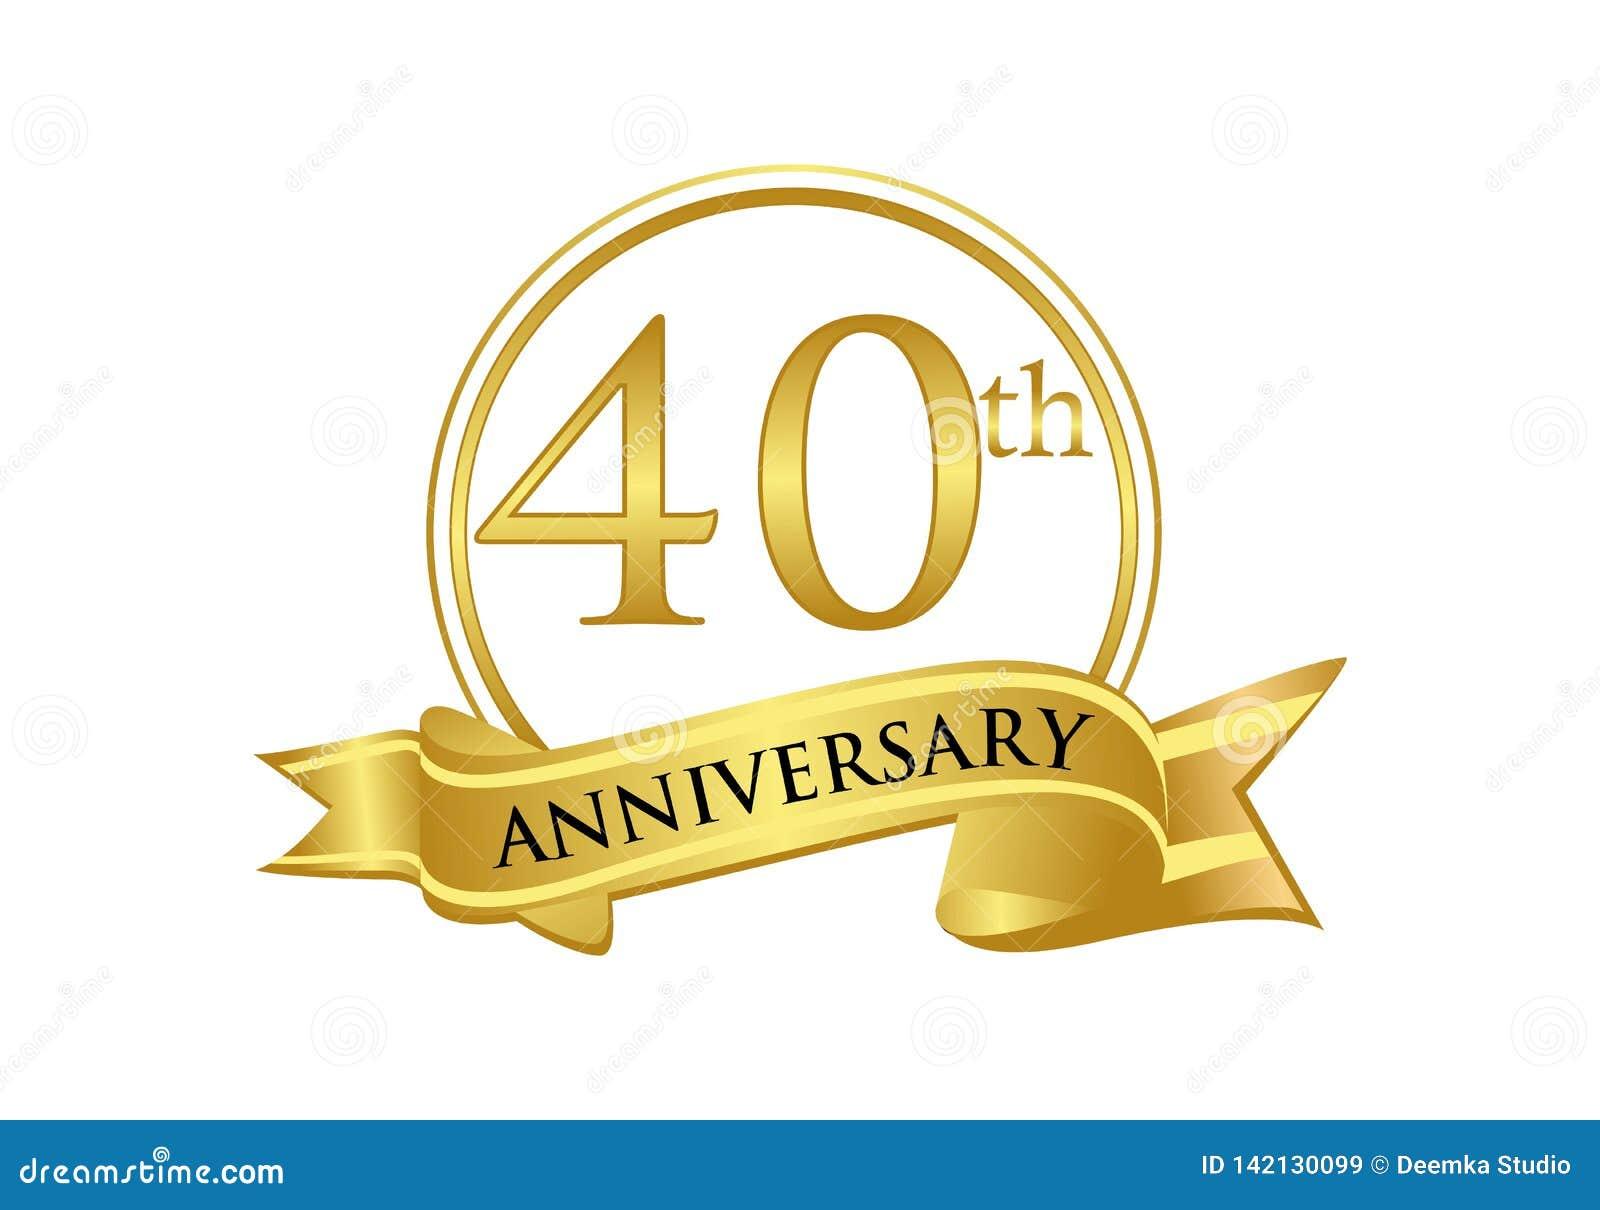 40th Anniversary celebration logo vector